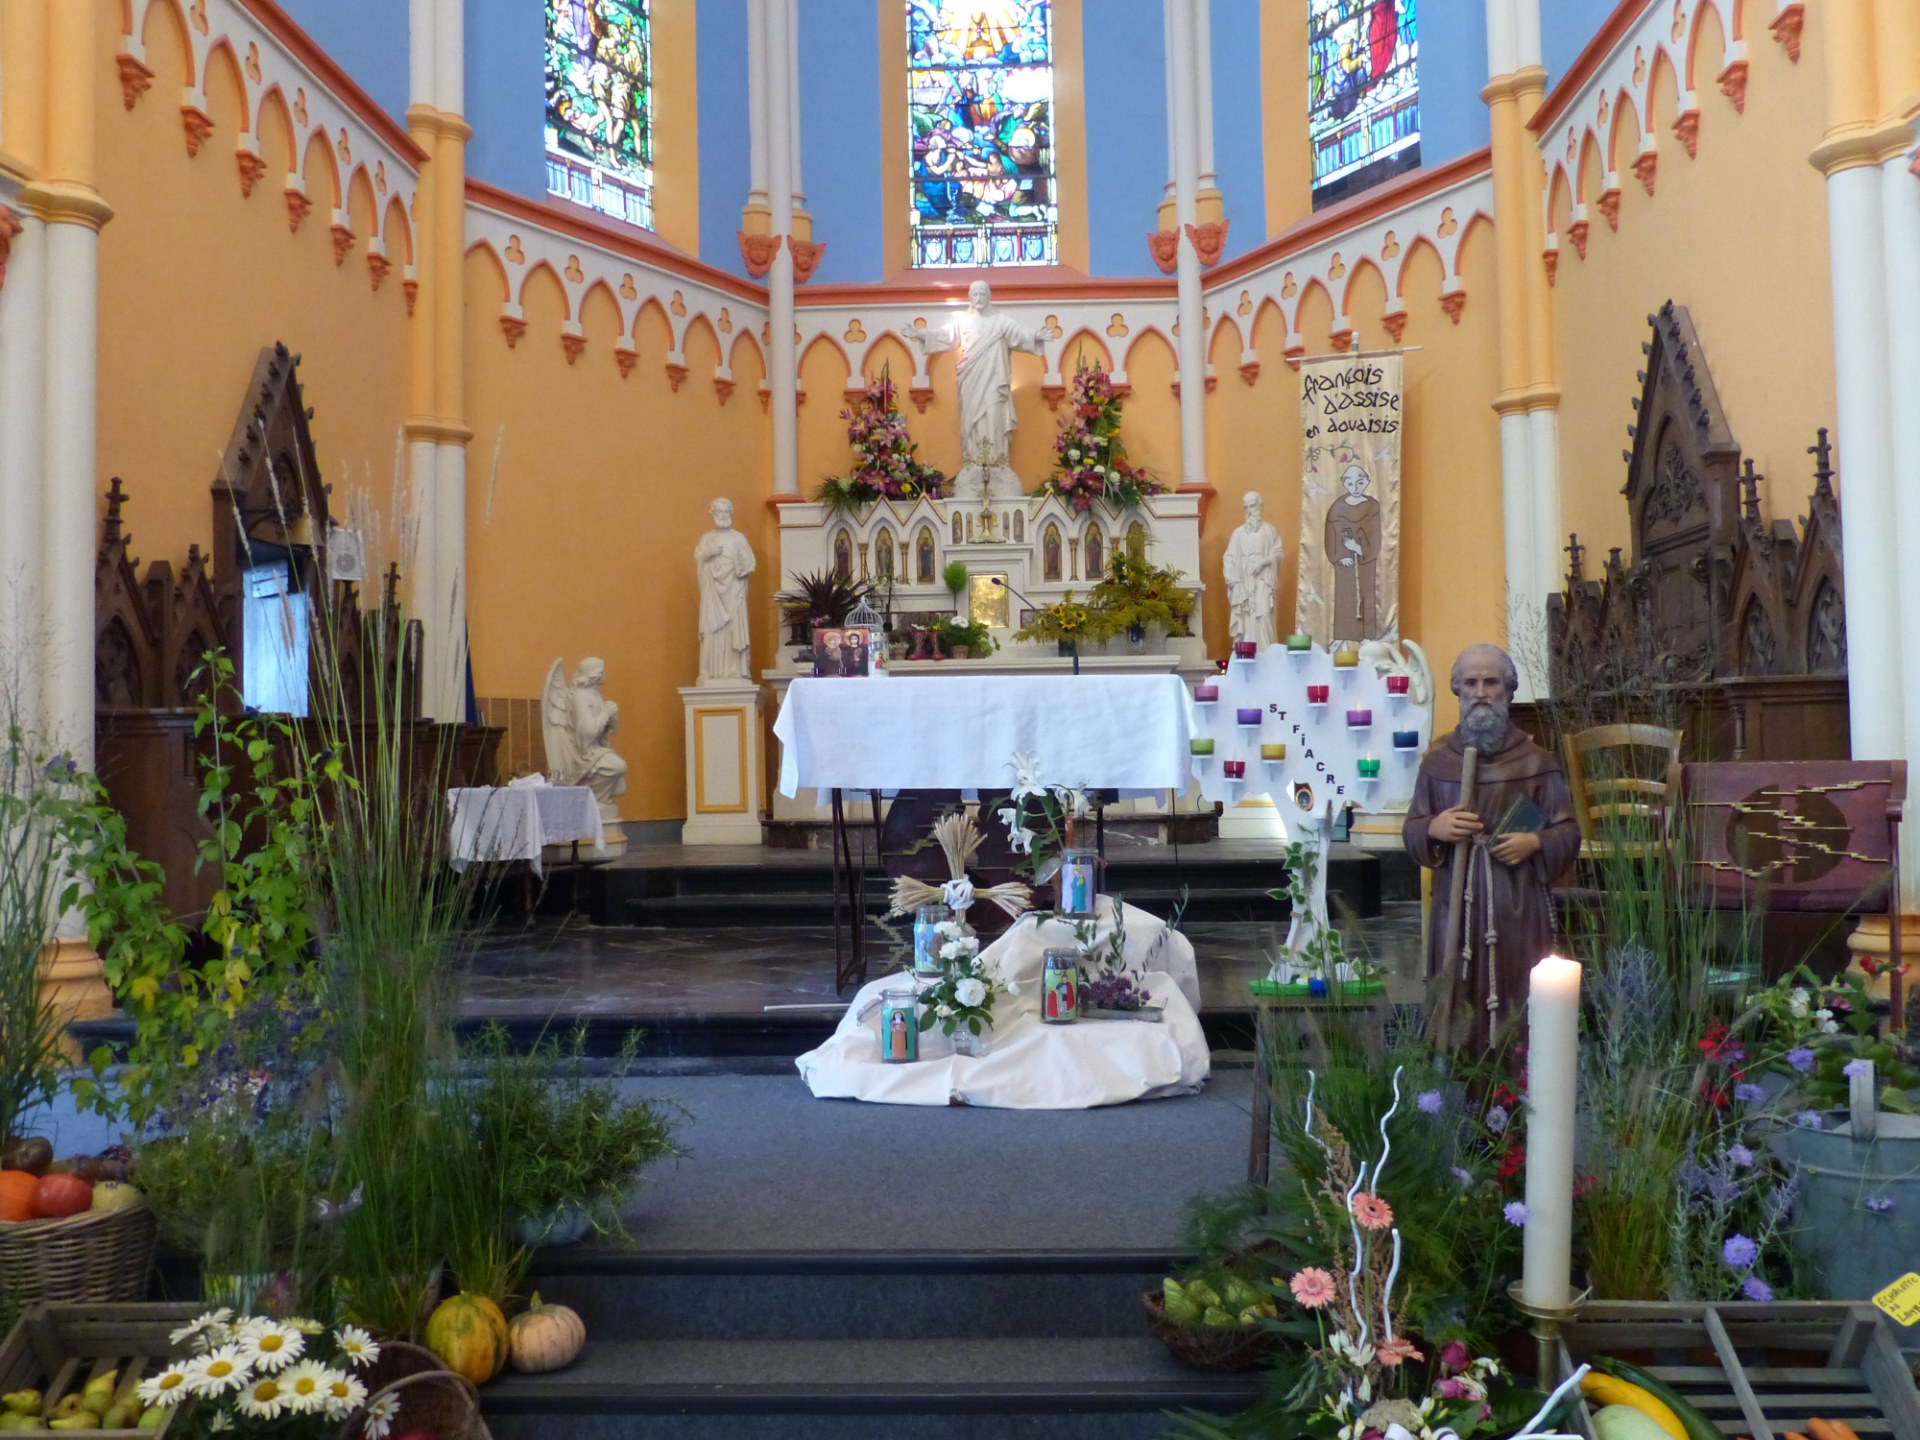 St Fiacre 78